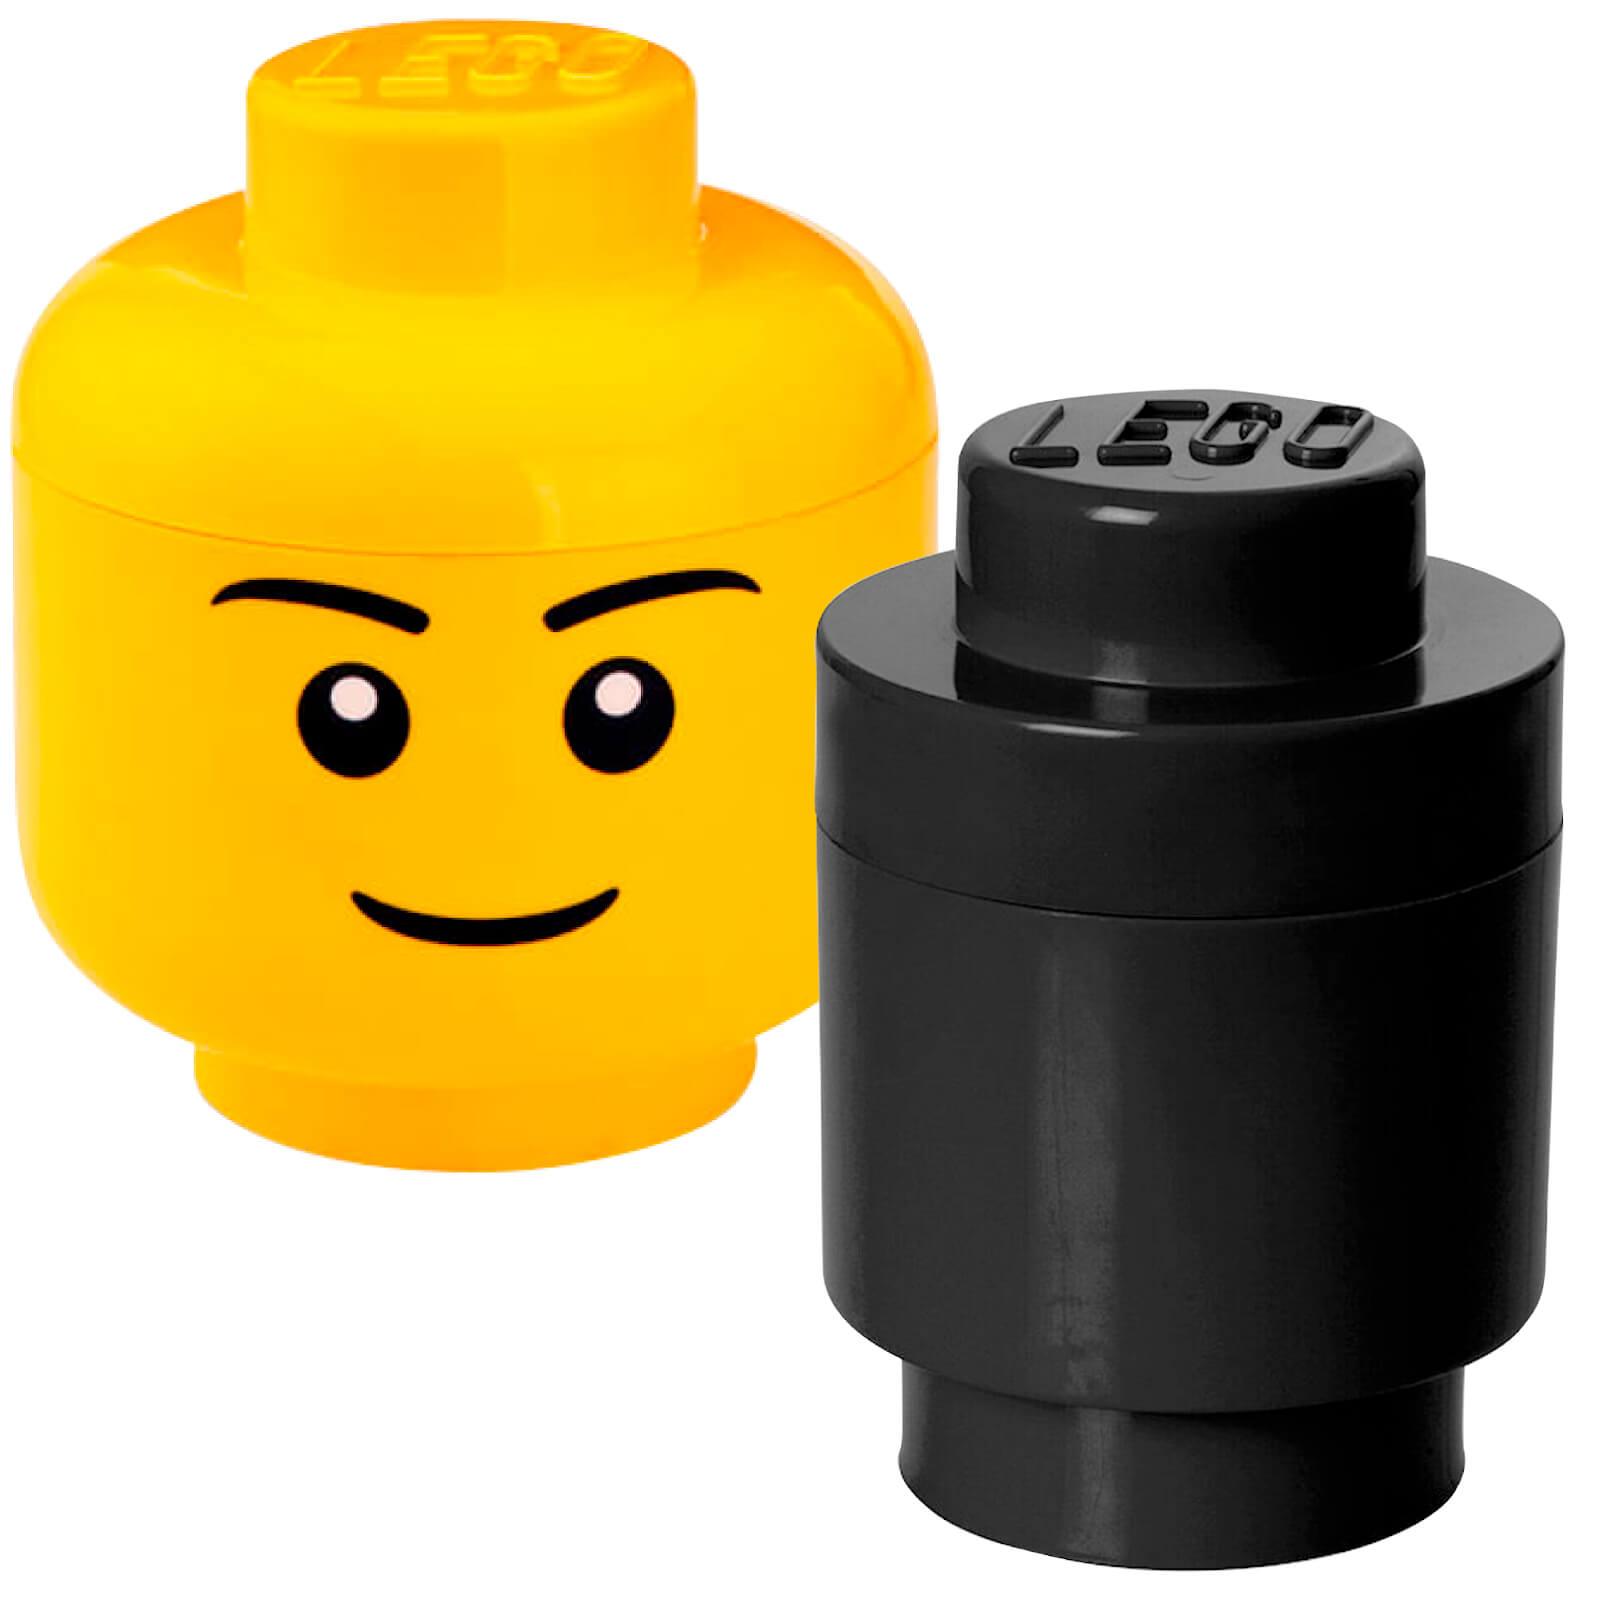 Image of LEGO Storage Head & Round Brick Bundle (Includes 1 Small Boy Head and 1 Round Brick Black)